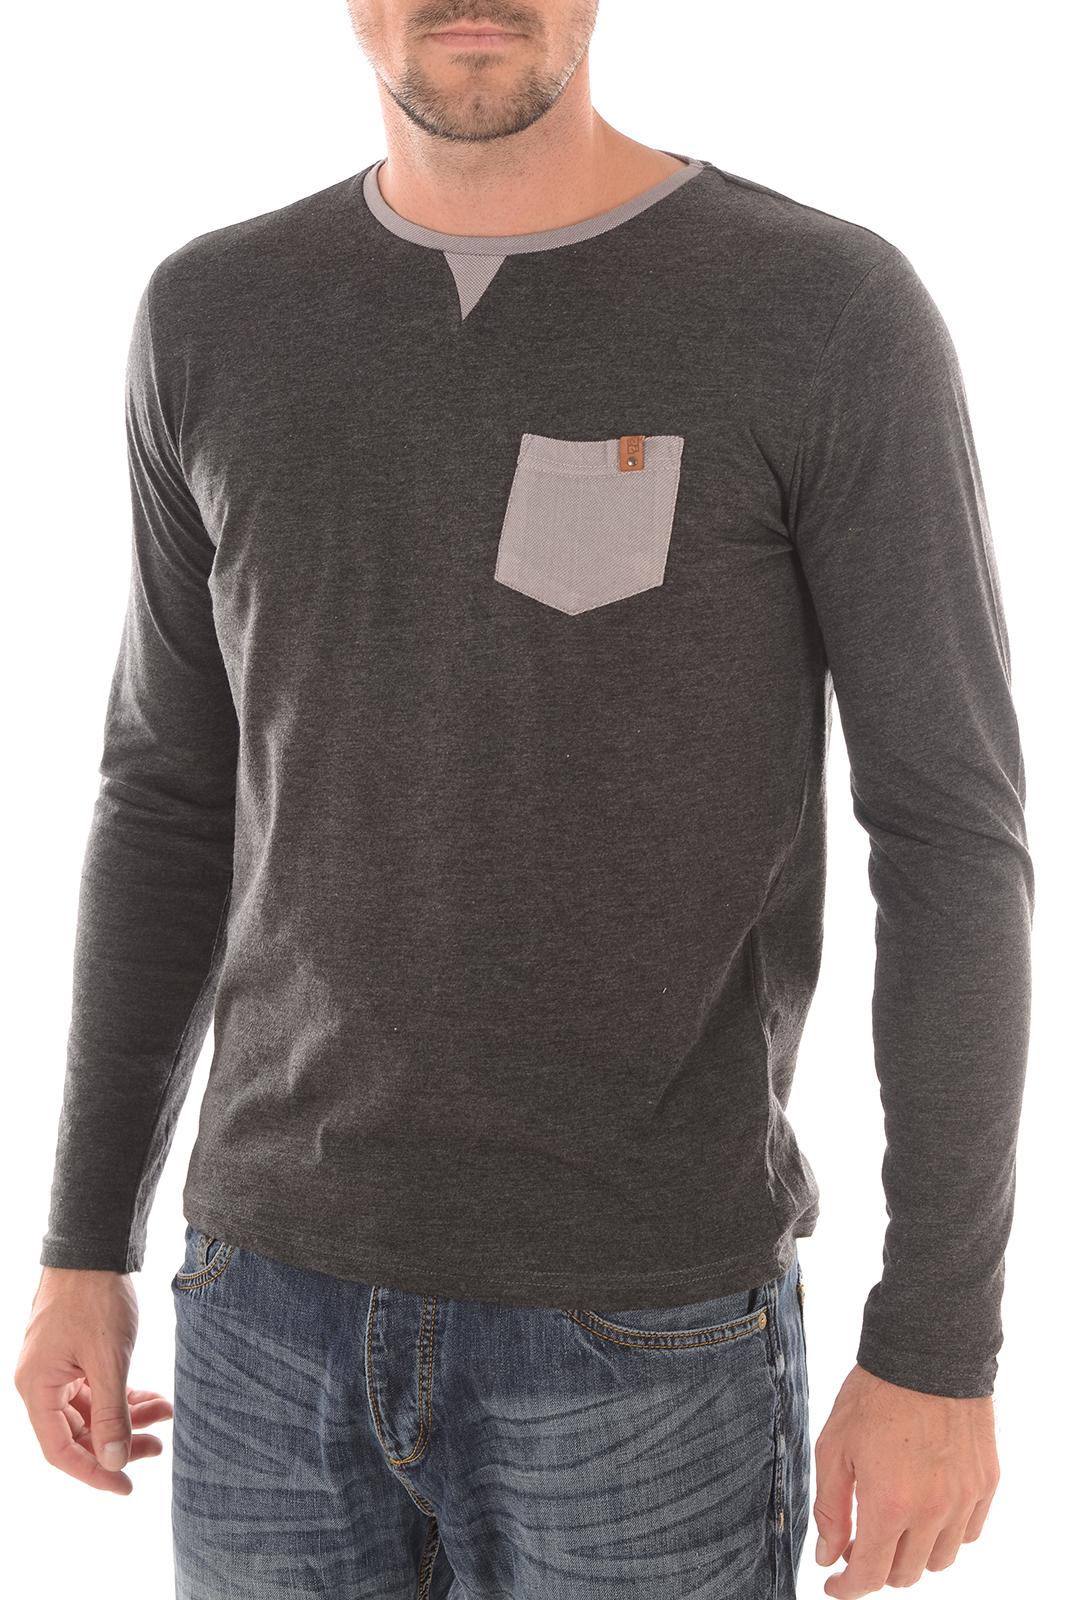 Tee-shirts  Biaggio jeans LADISLA GRIS FONCE